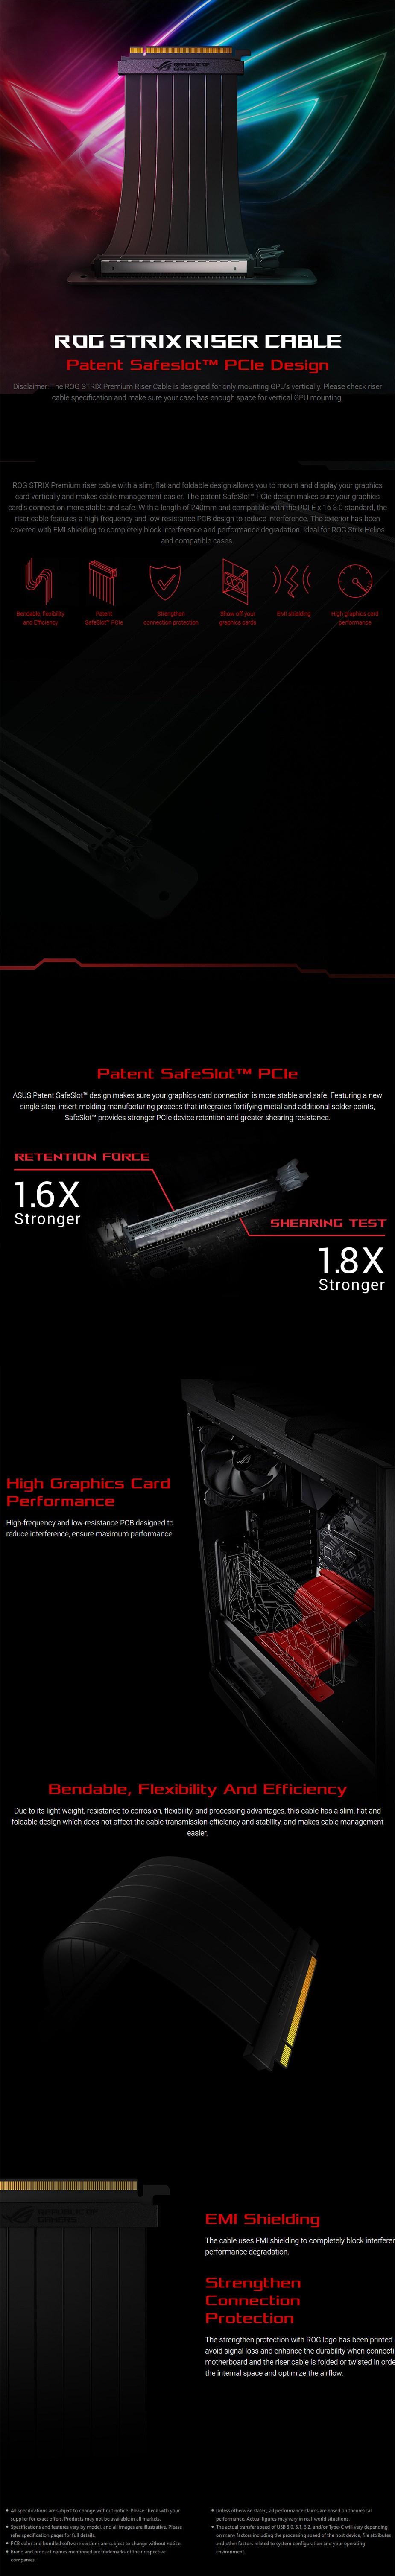 asus-rog-strix-pcie-30-x16-riser-cable-240mm-ac37564-4.jpg